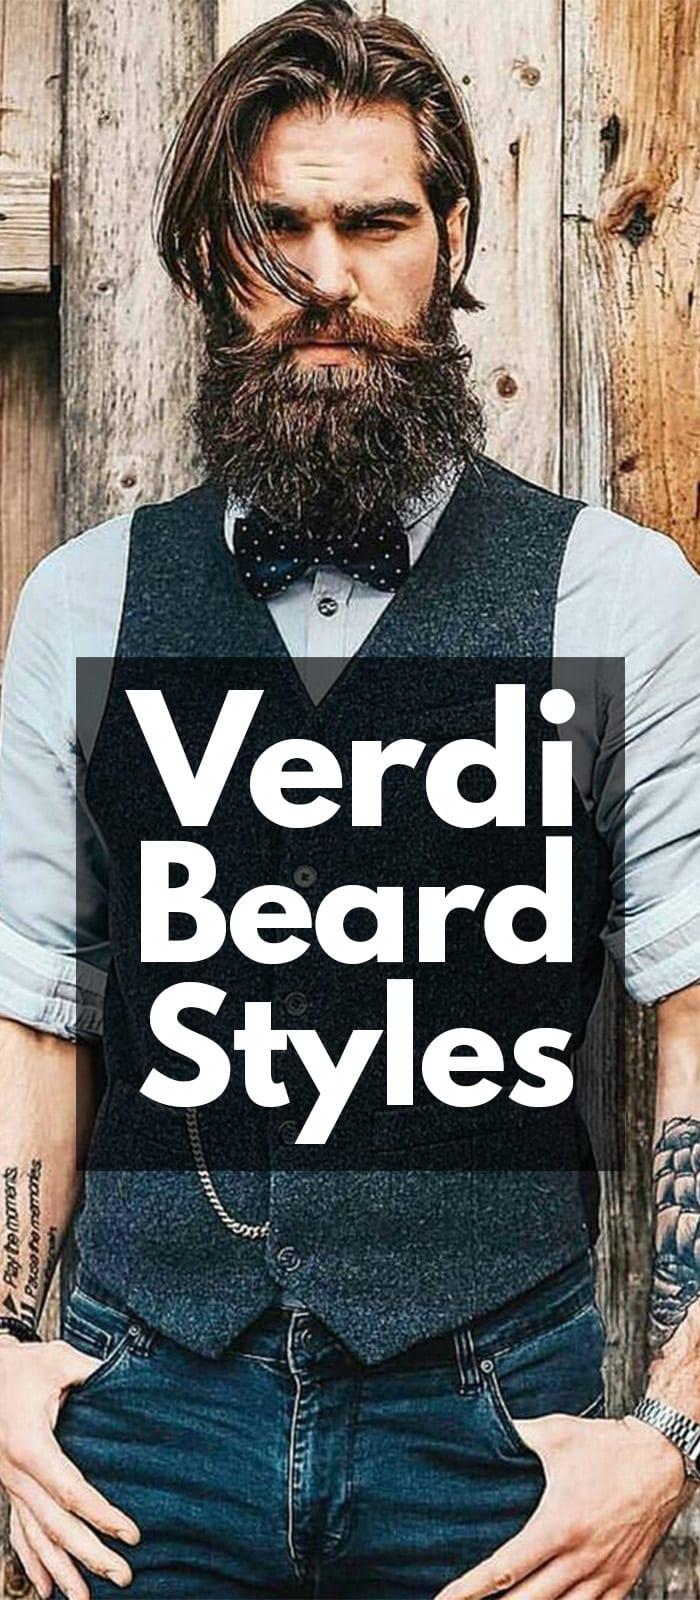 Verdi Beard Styles